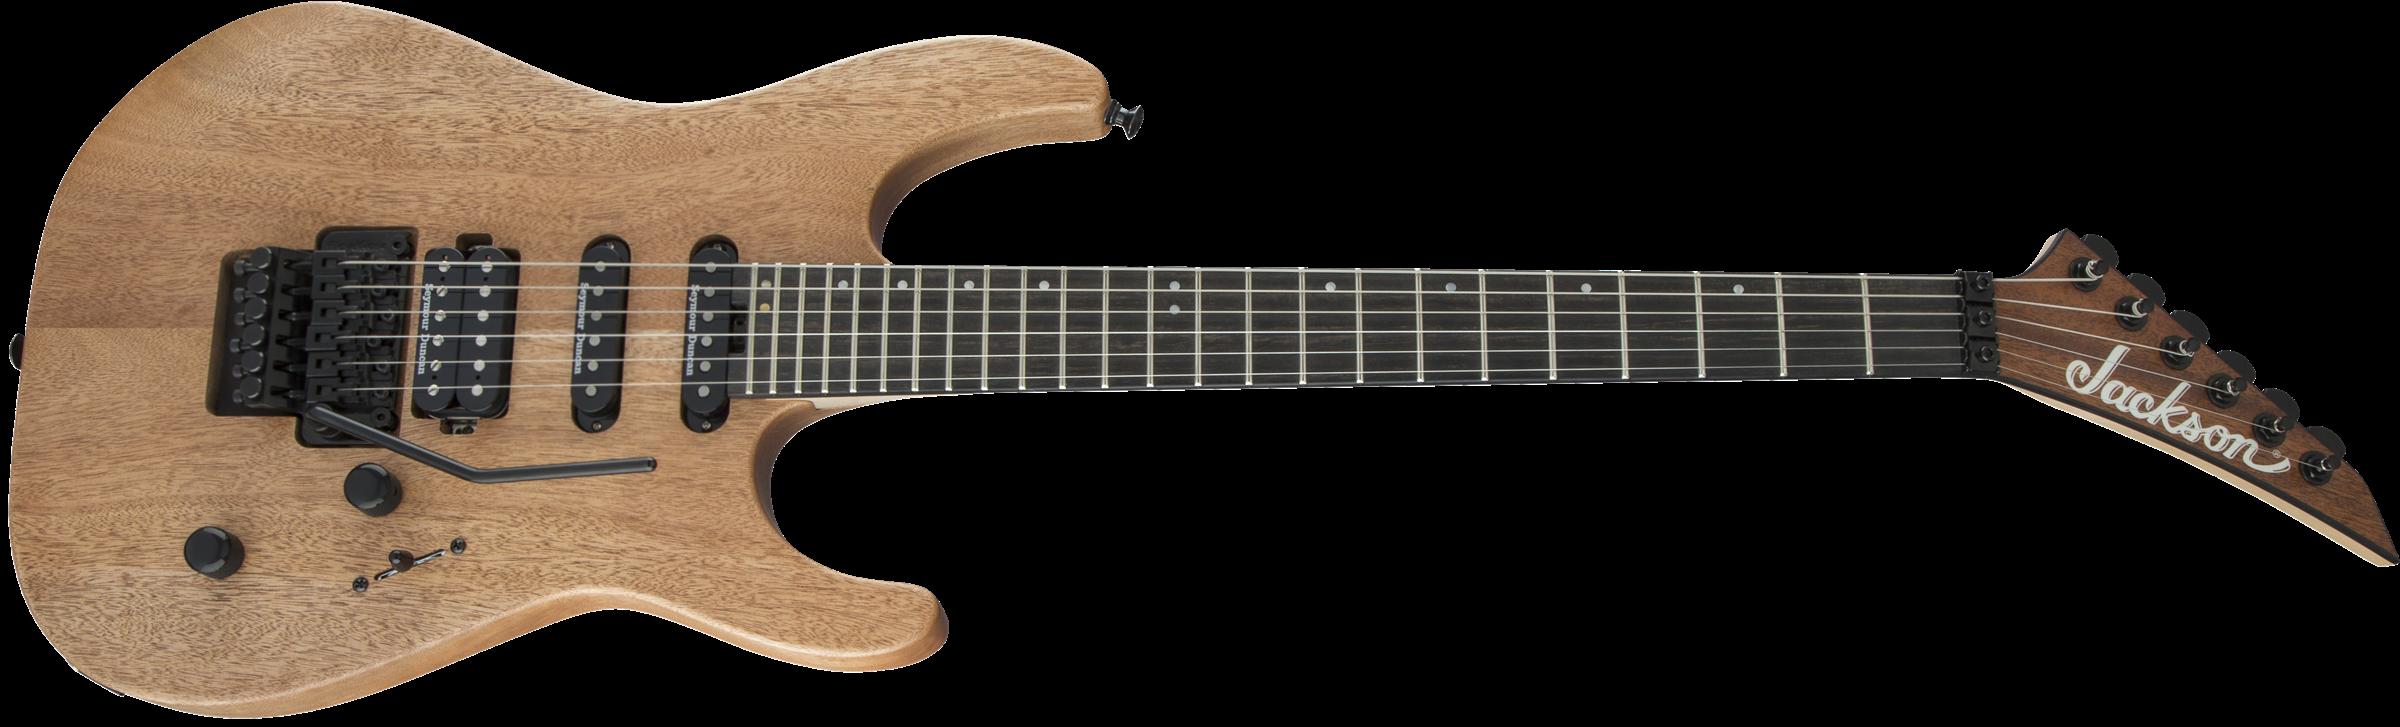 Jackson Hss Guitar Wiring Diagram Schematics Dinky Pro Series Dk3 Okoume Ebony Fingerboard Natural